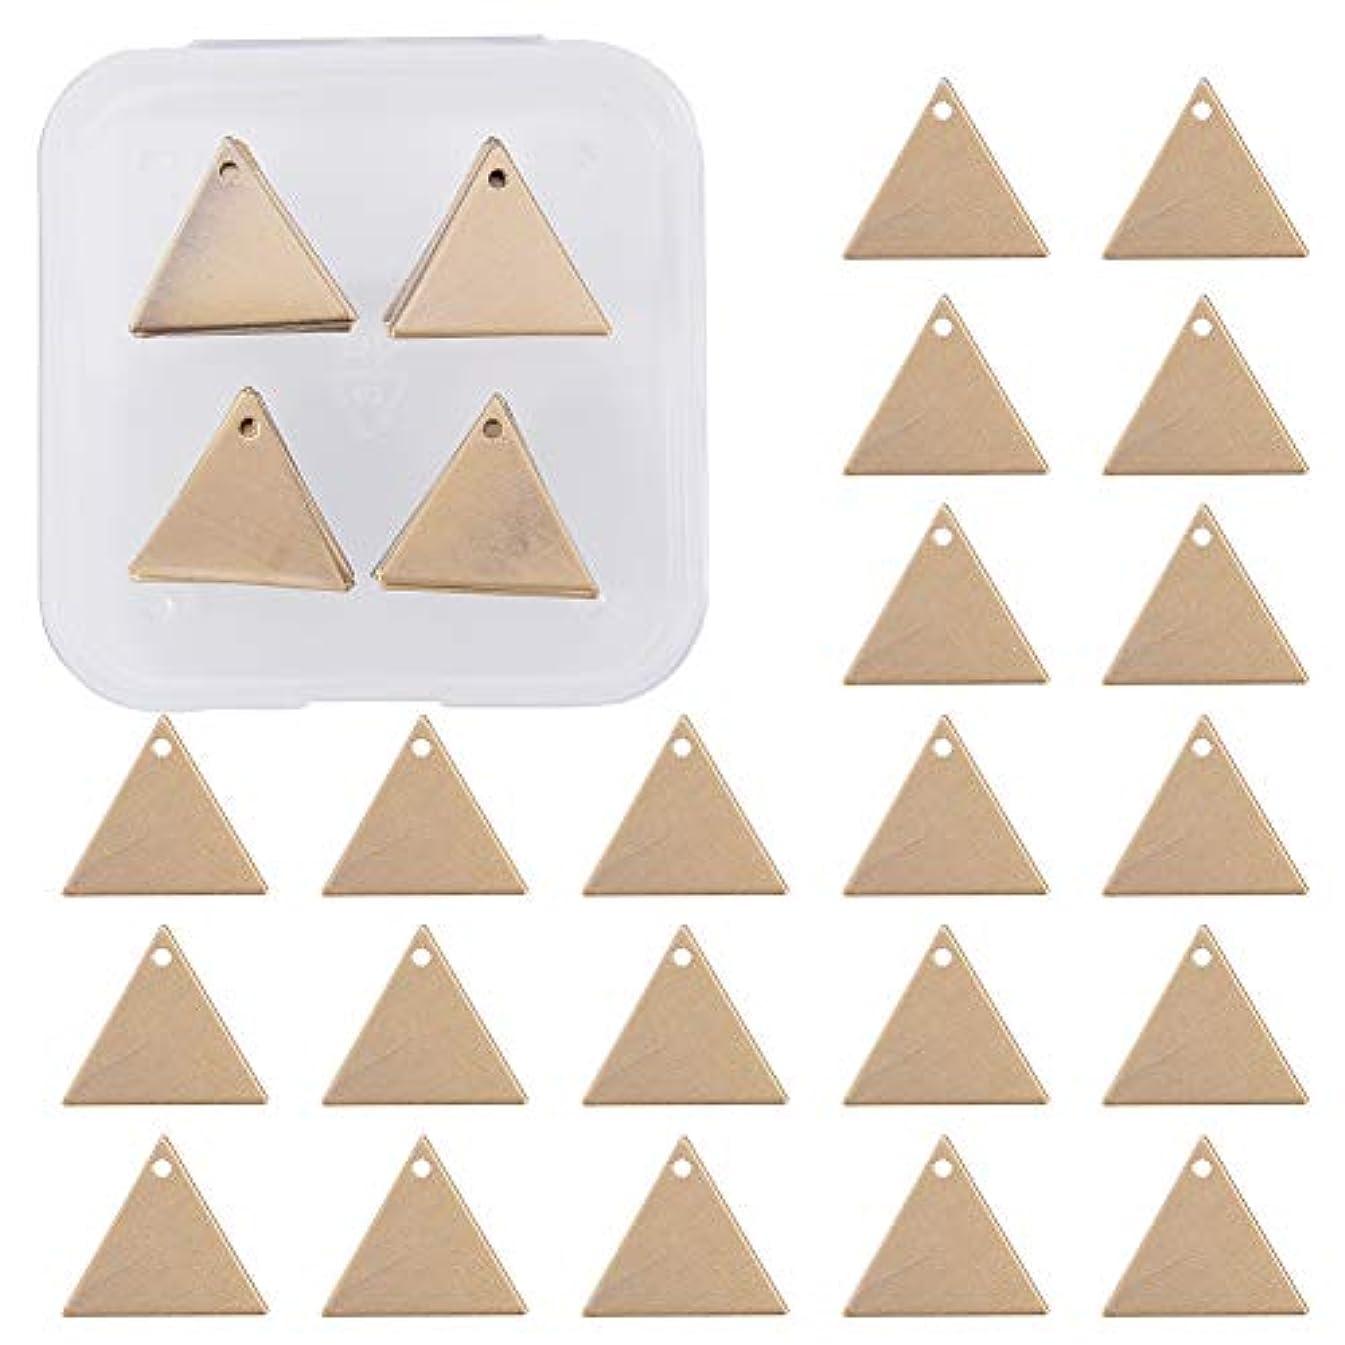 BENECREAT 30 Pack Stamping Blanks Brass Blank Pendants for Bracelet Earring Pendant Charms Dog Tags - 0.70x0.62, Triangle Shape